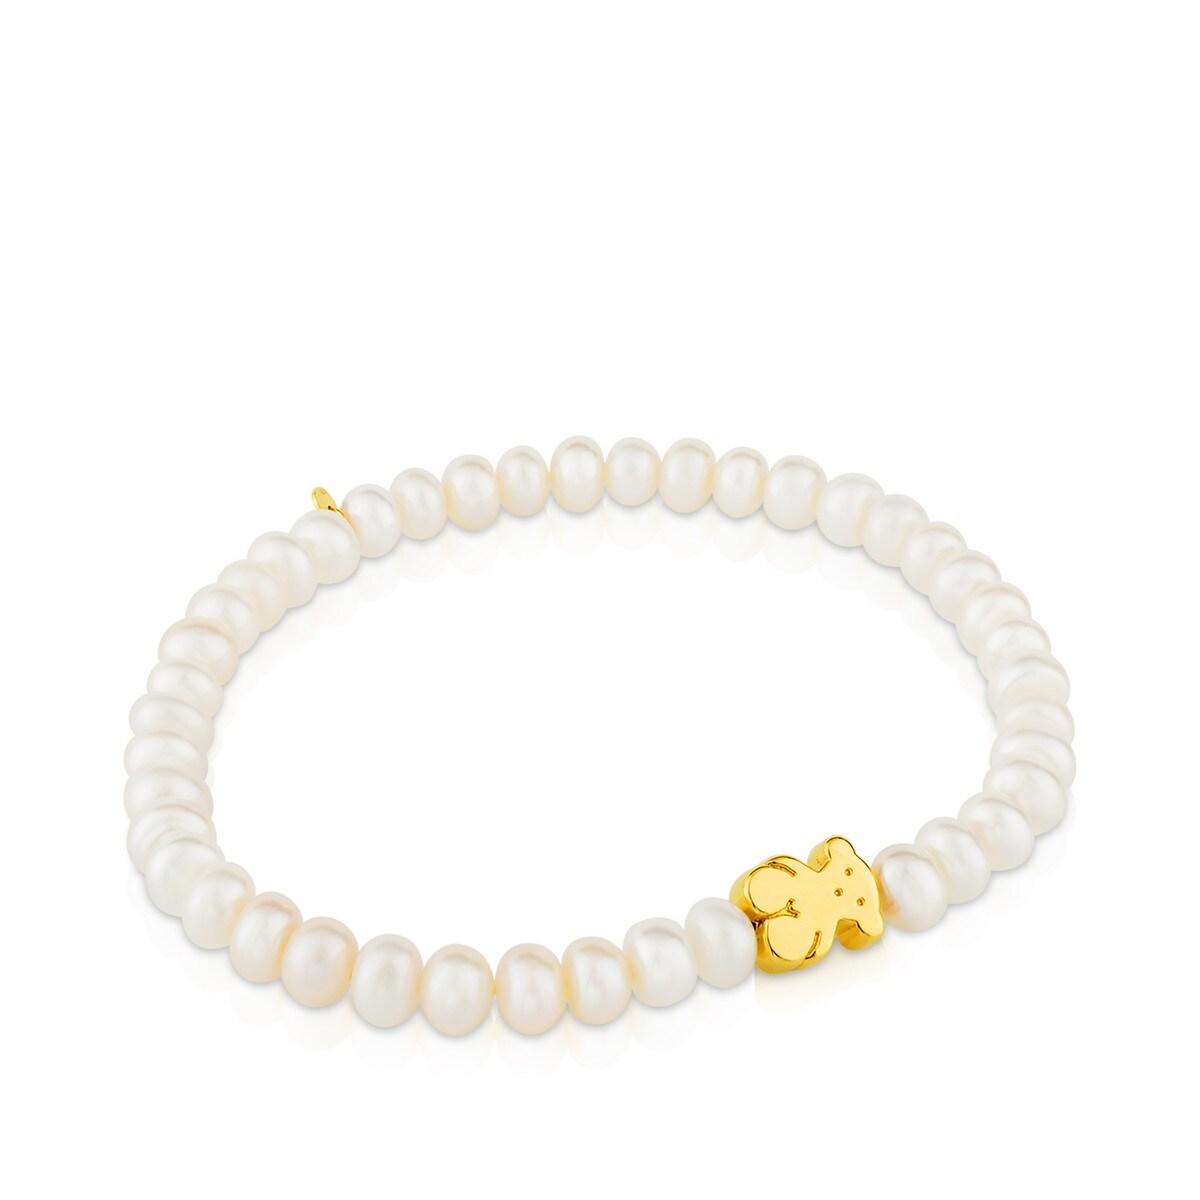 7b839bf84 Gold Sweet Dolls Bracelet - Tous Site US